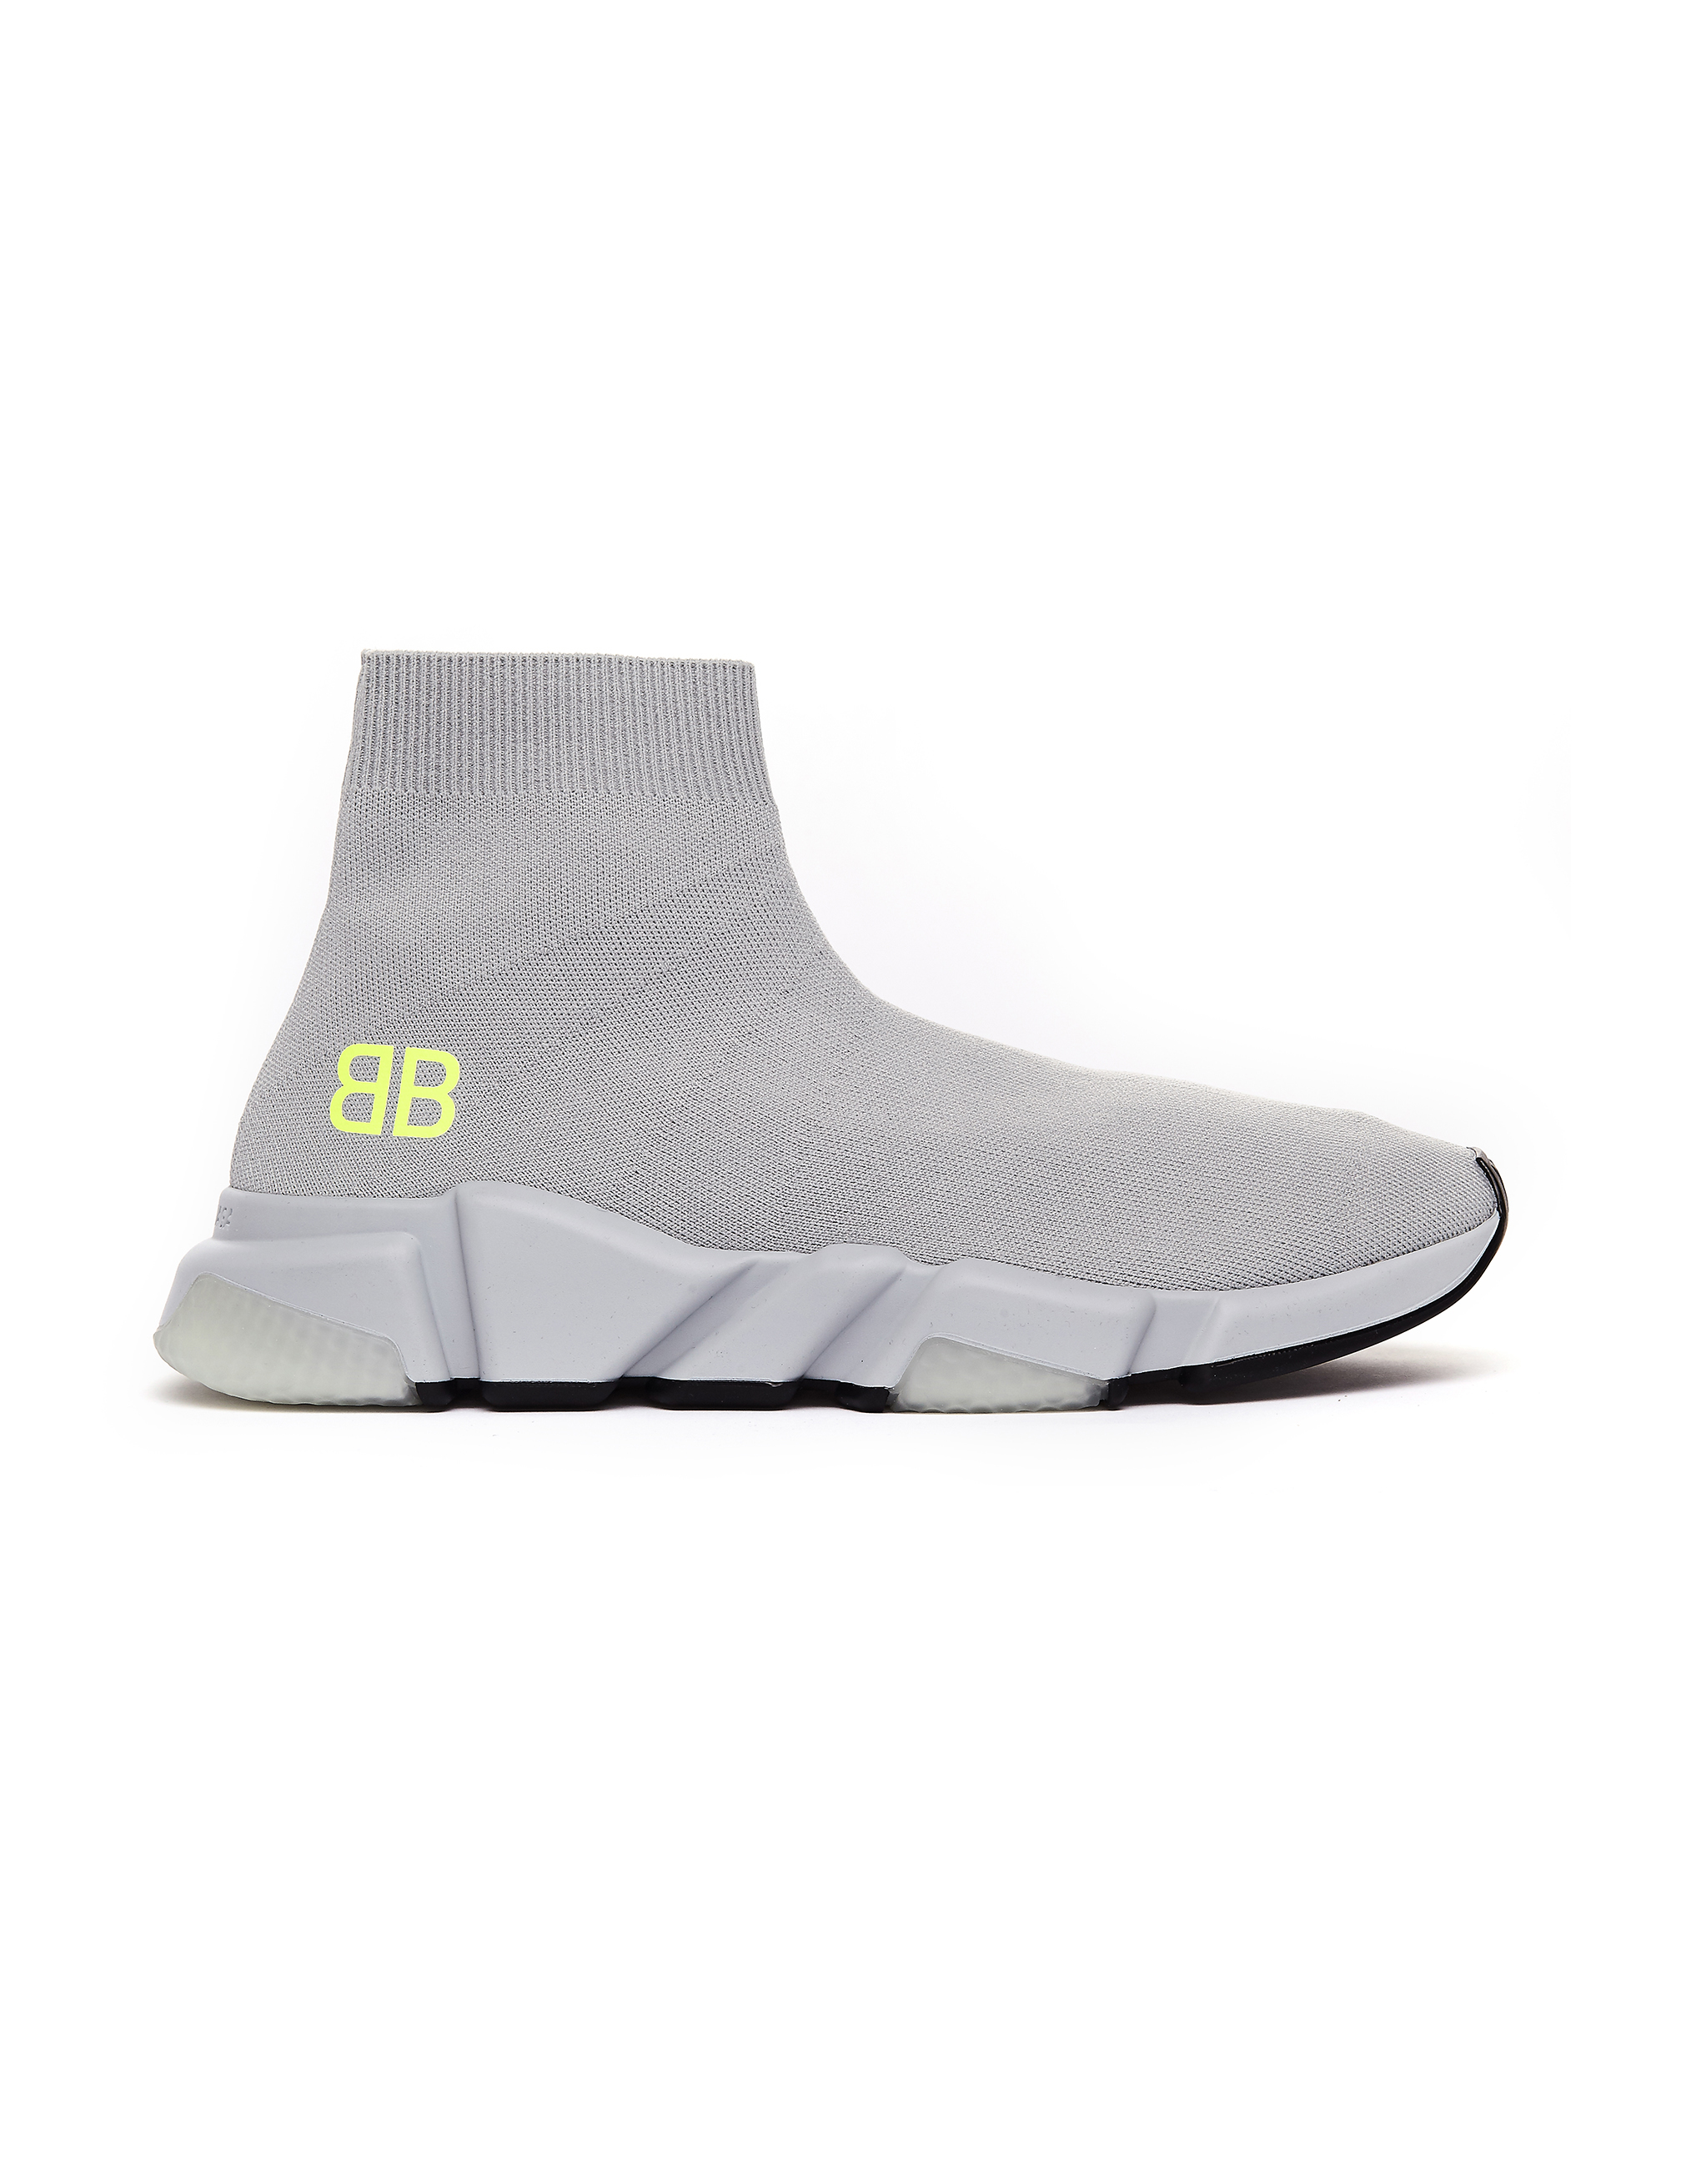 Balenciaga Speed Trainer BB Sneakers